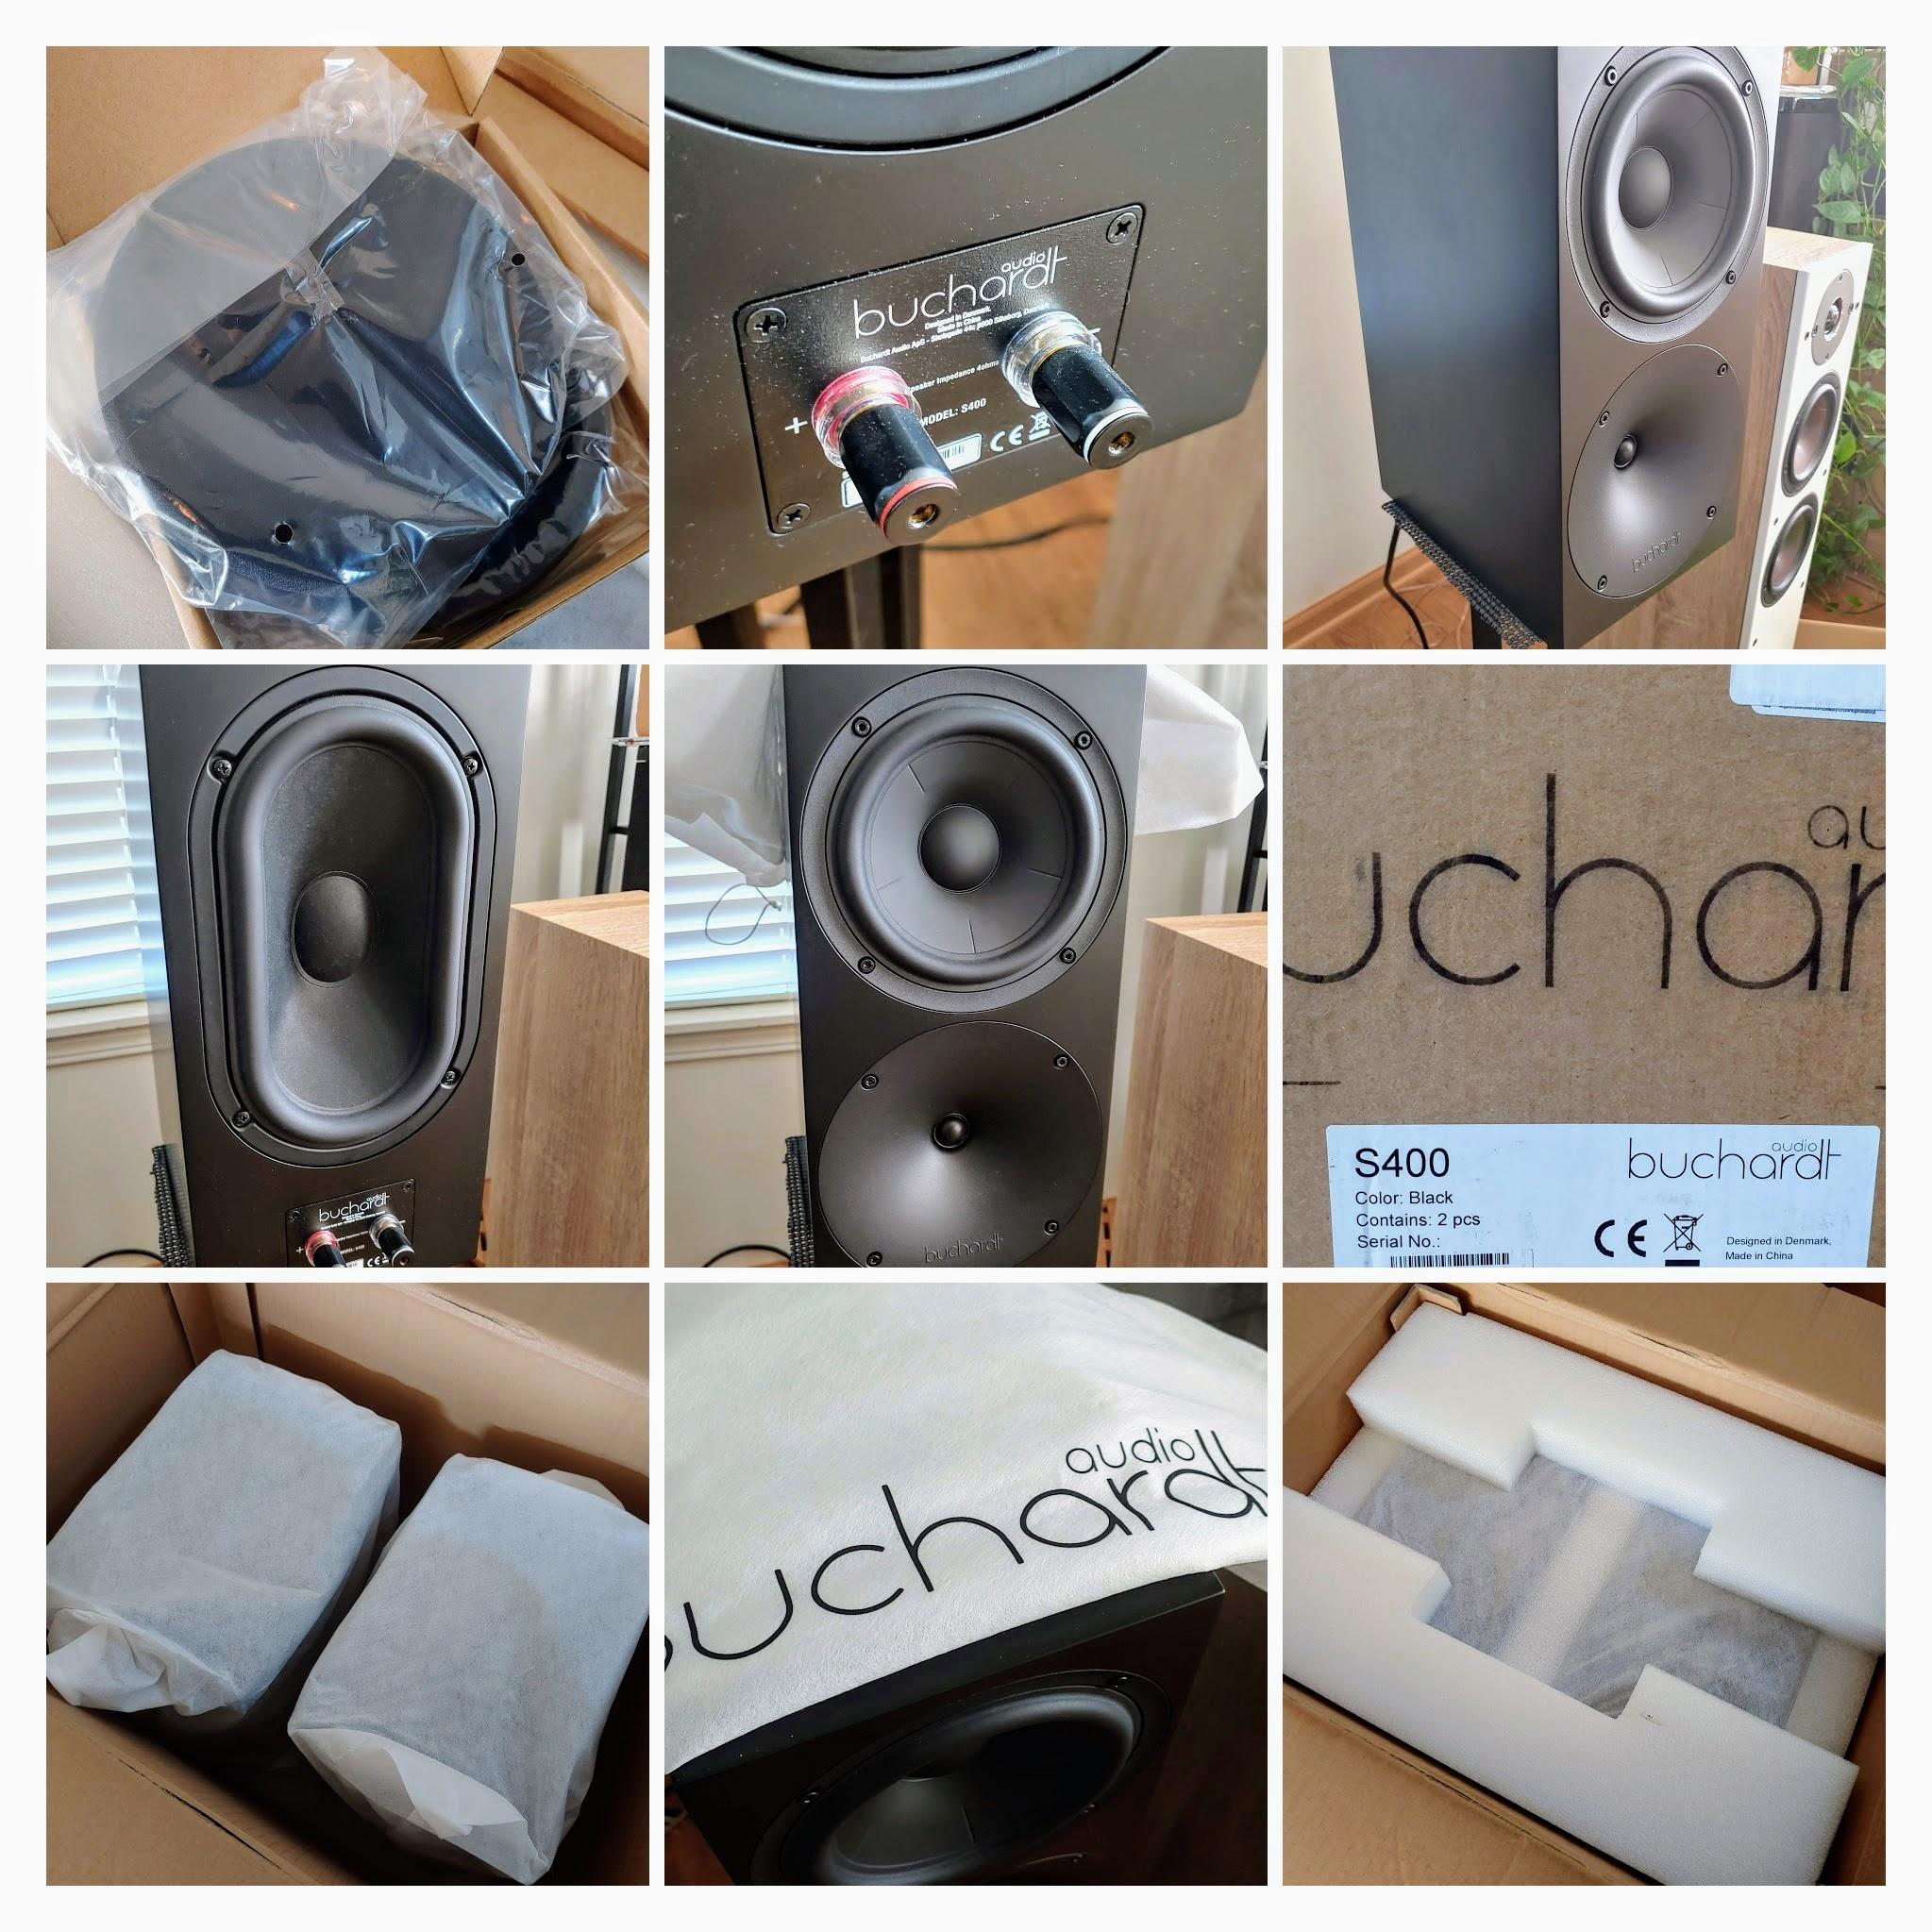 Buchardt Audio S400 Bookshelf Speaker Review: My Uncensored Take On A Seductive Speaker!